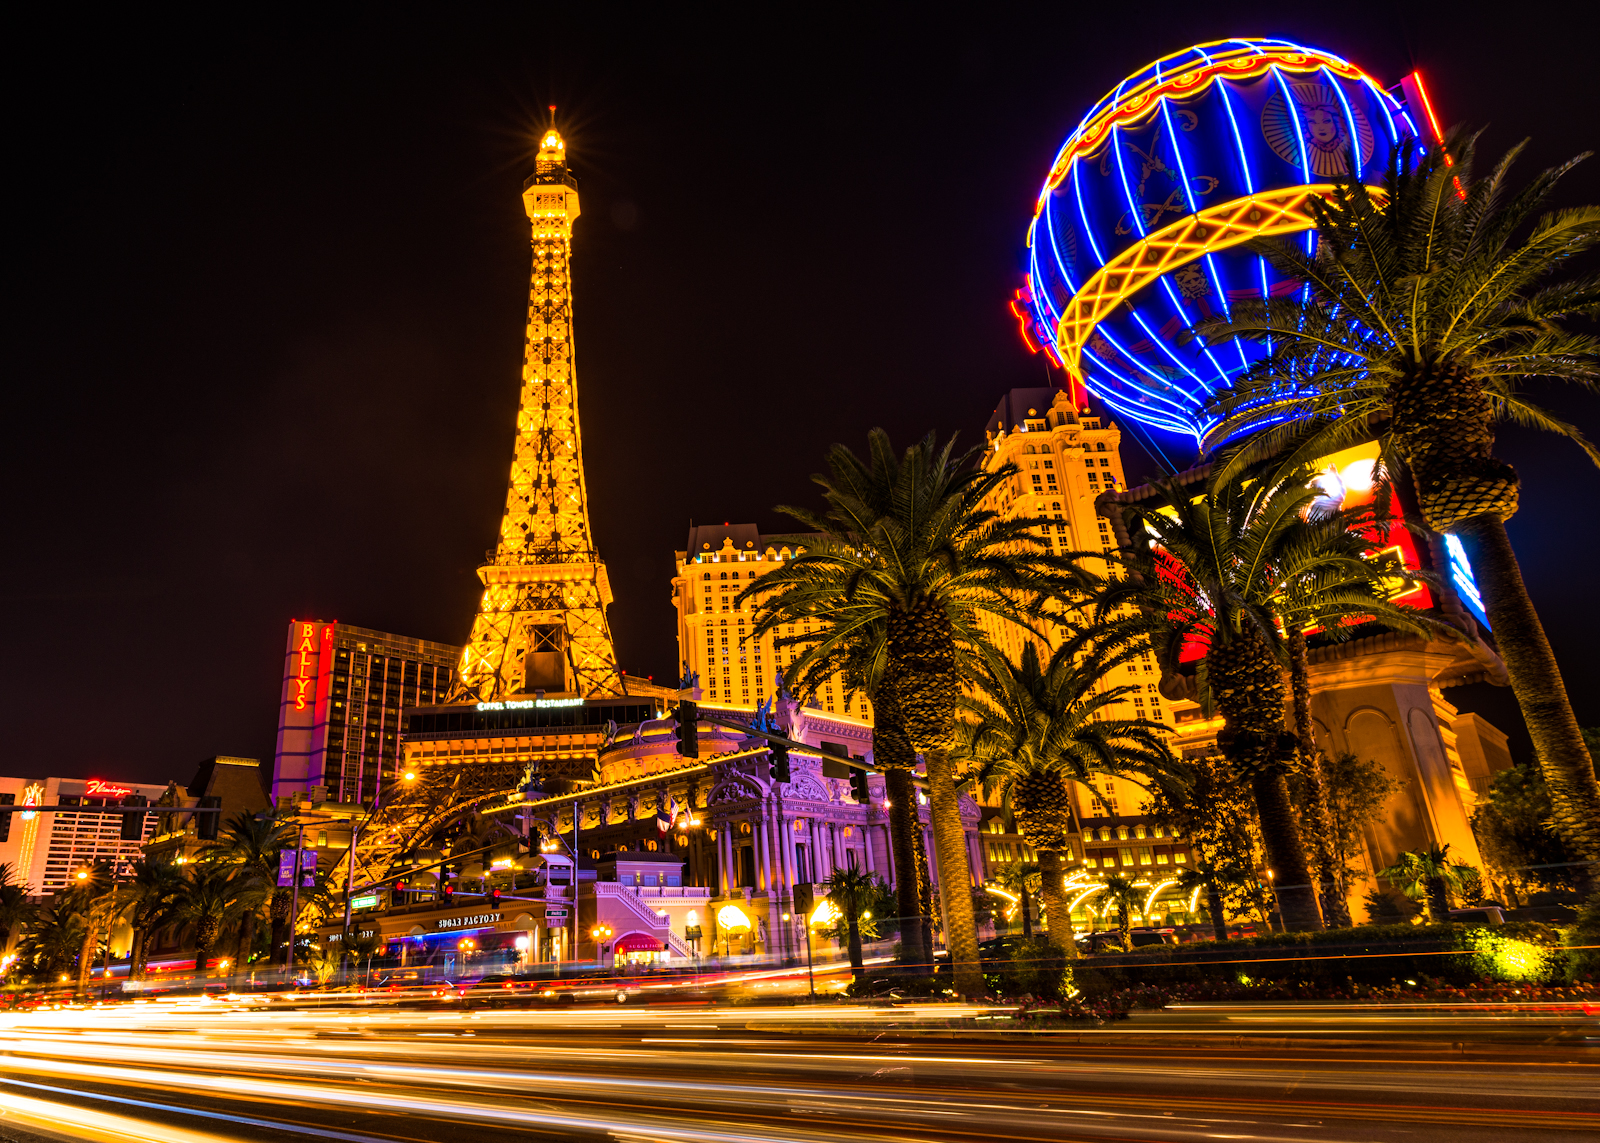 Free Download Las Vegas Hd Desktop Wallpapers 1600x1143 For Your